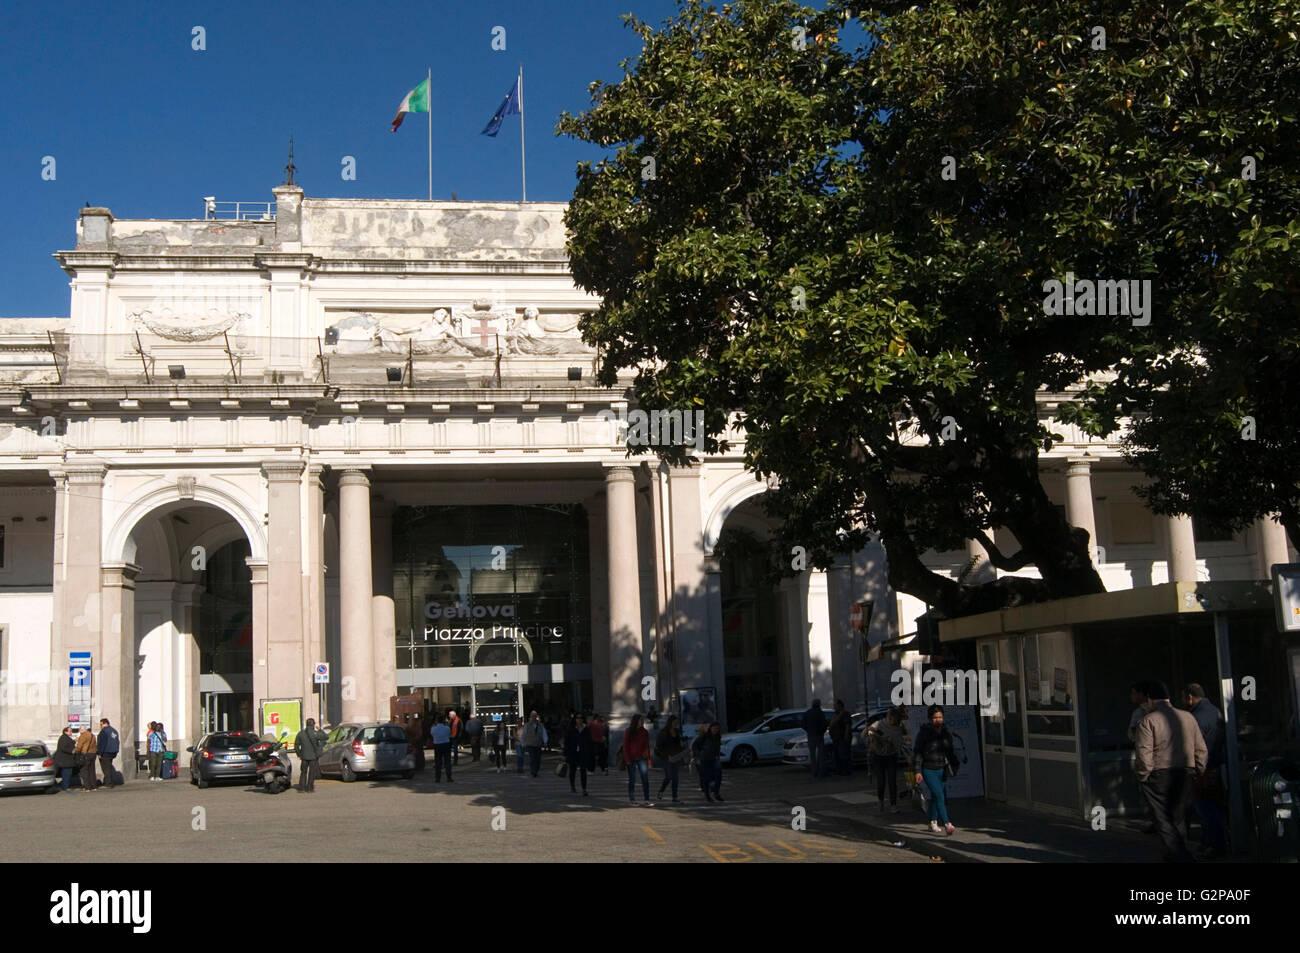 Porta genova station stock photos porta genova station - Genova porta principe ...